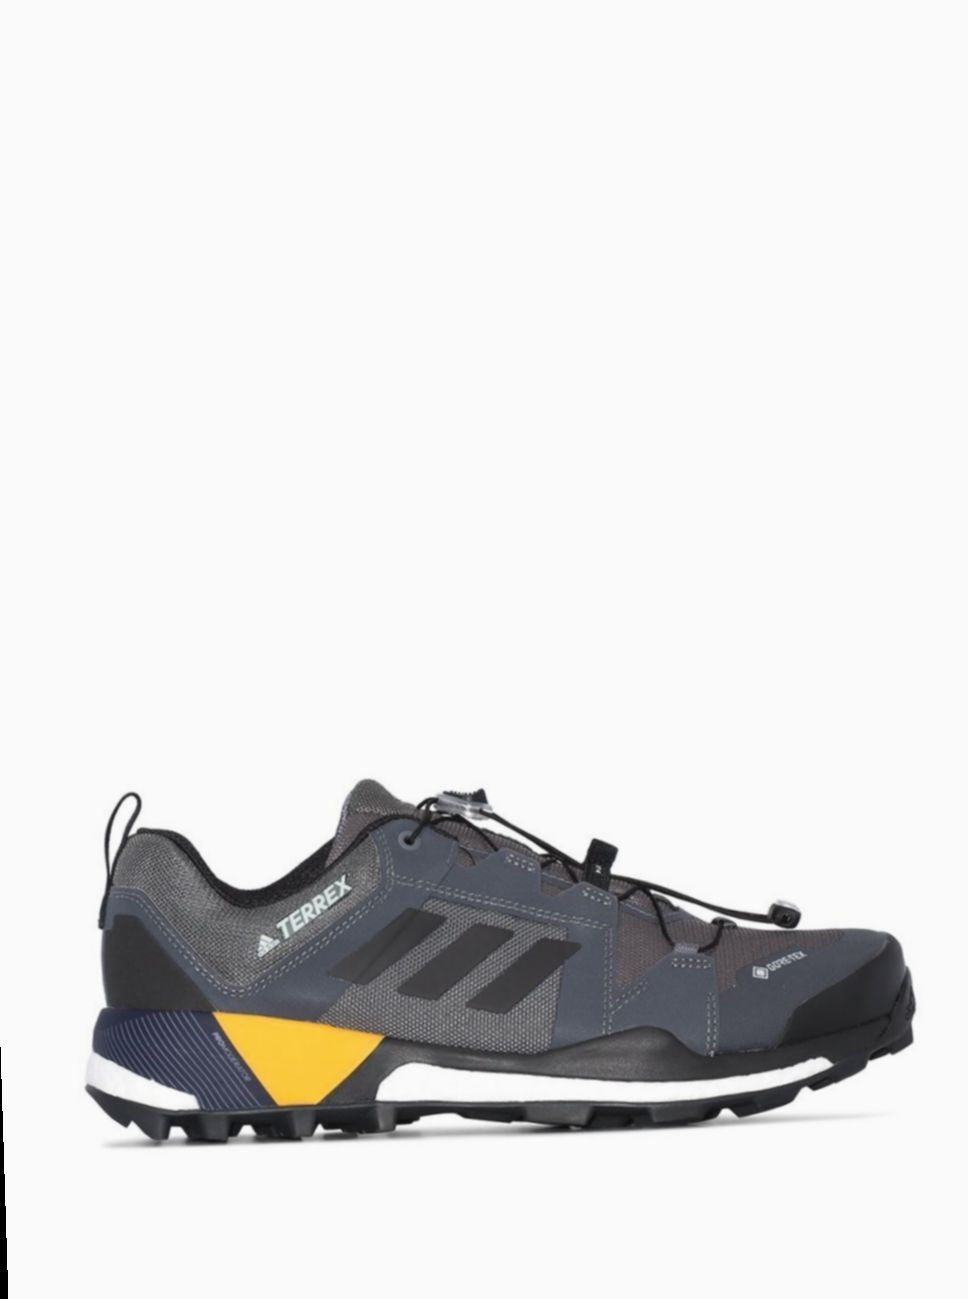 ✔ Fashion Shoes Nike Adidas Originals #style #fitness #uae